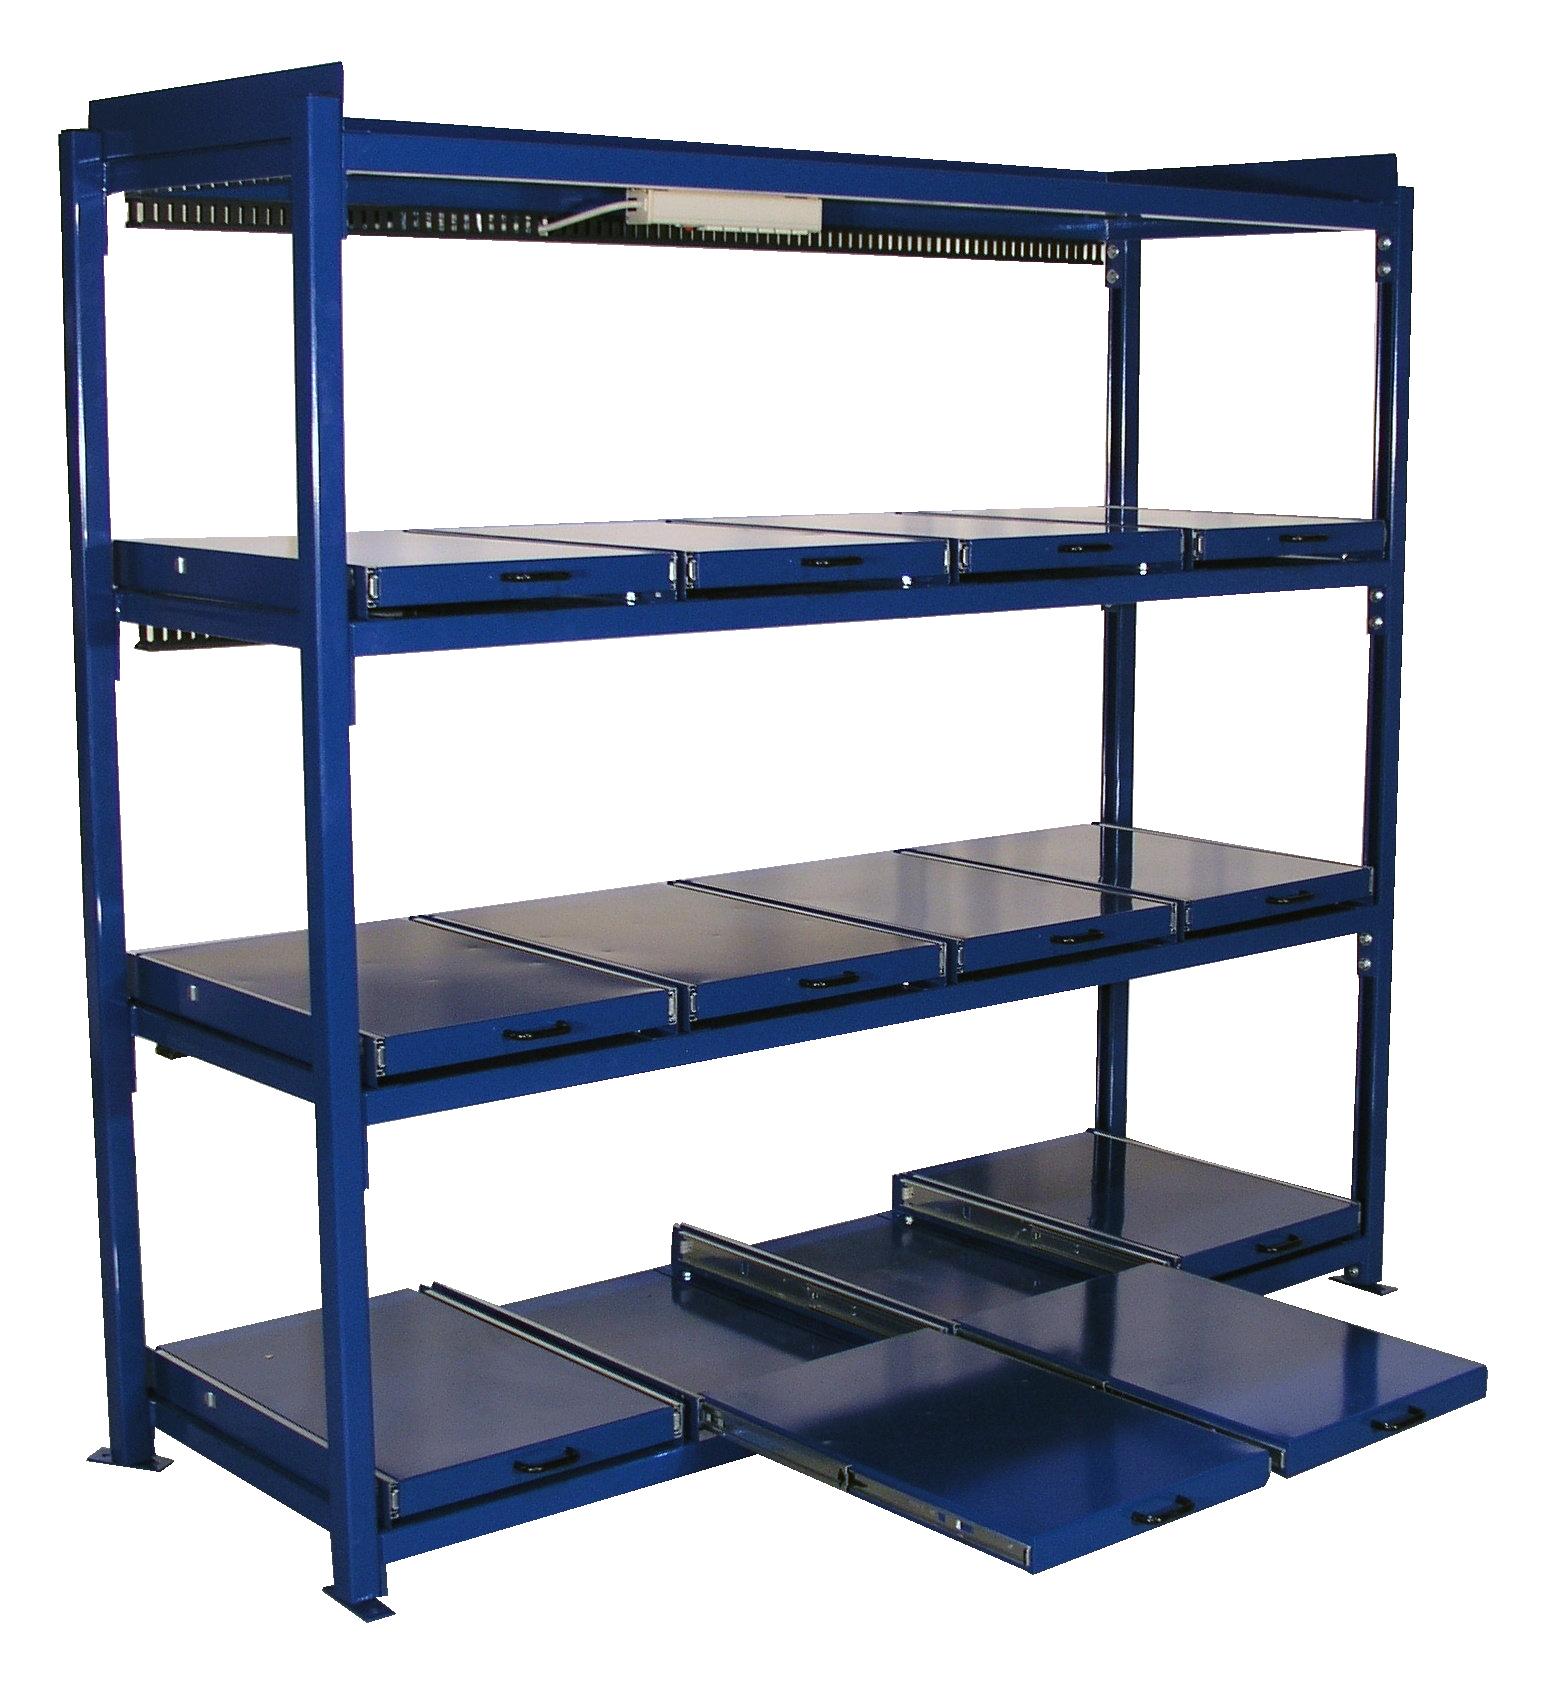 workbenches idea file idea file pro line workbenches. Black Bedroom Furniture Sets. Home Design Ideas